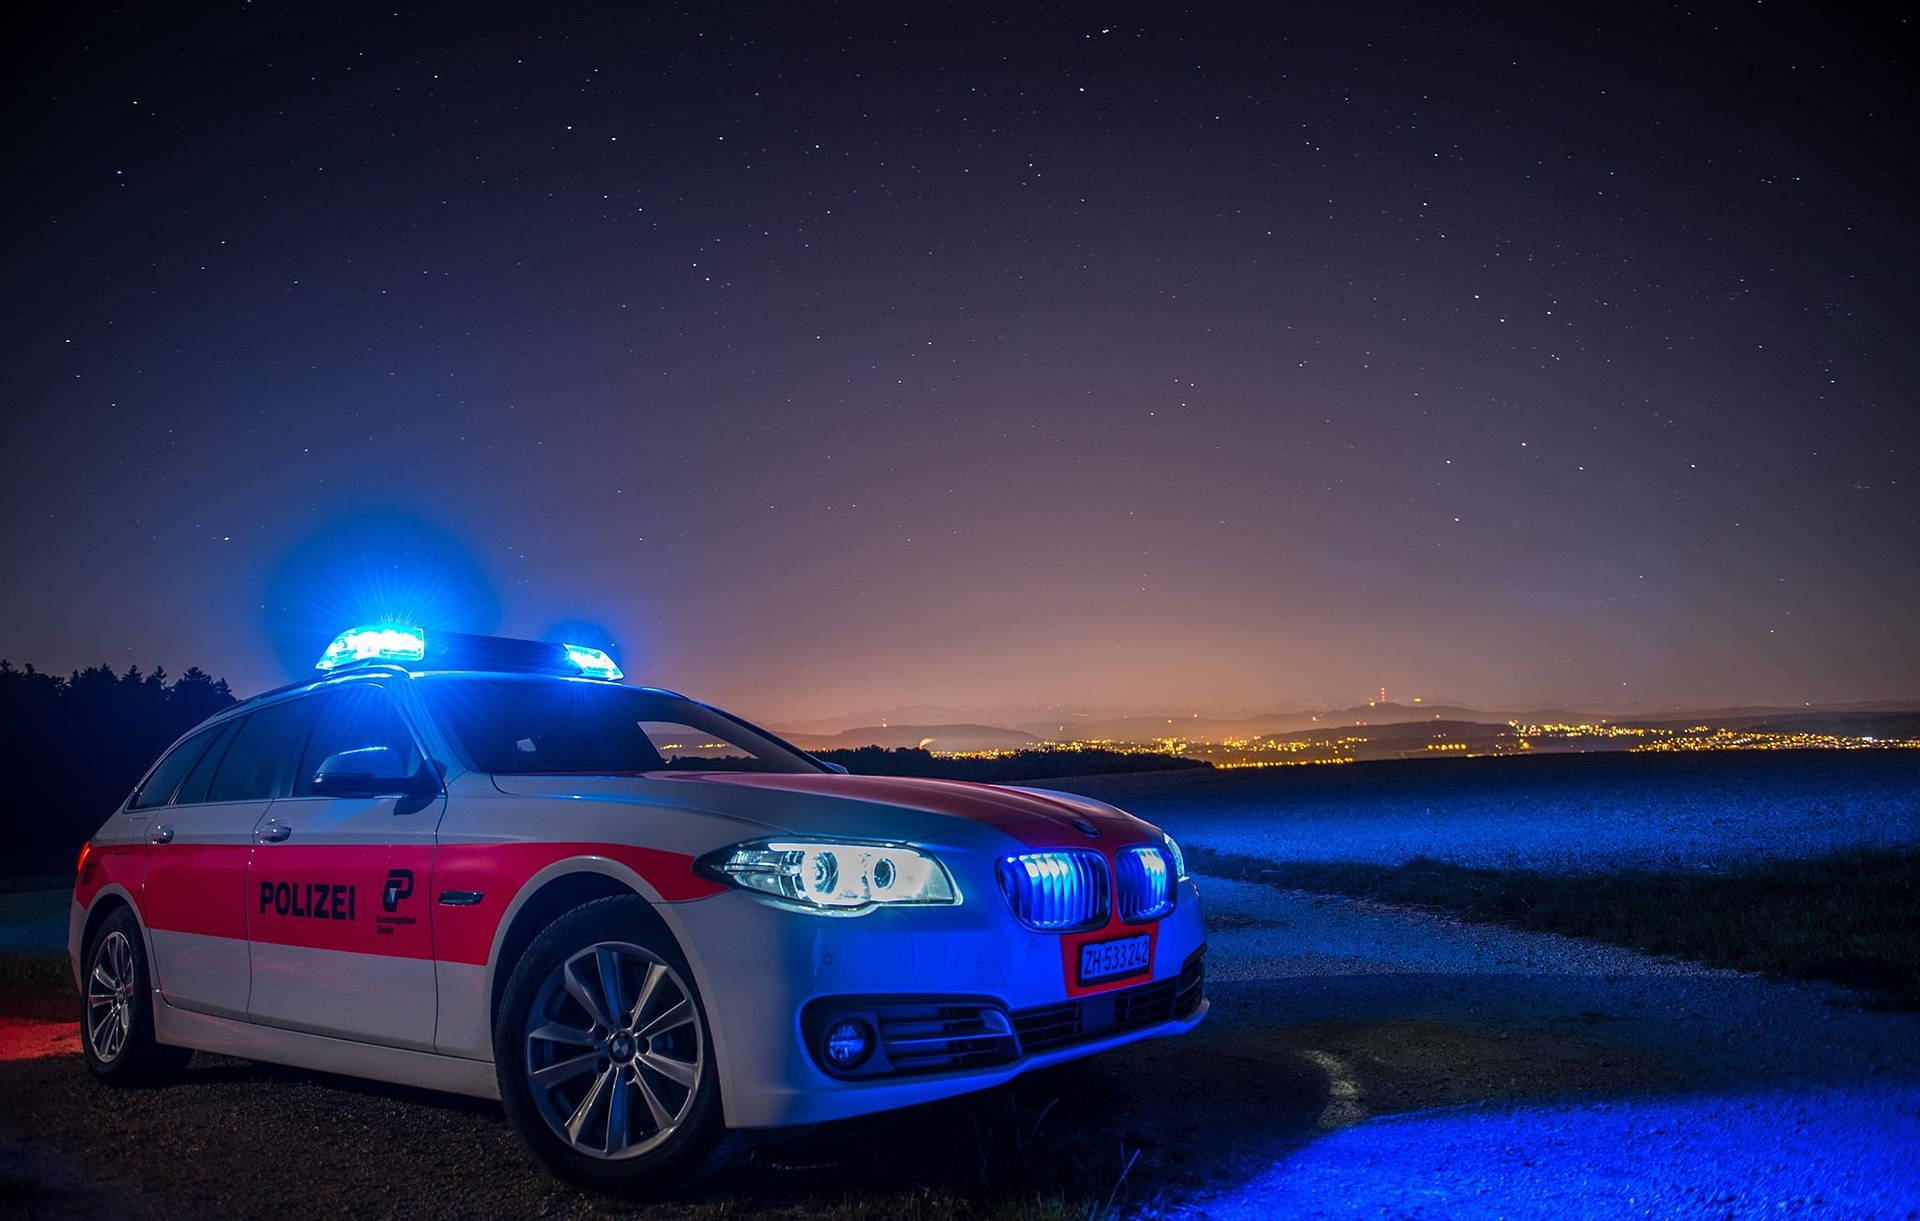 Police, car, night